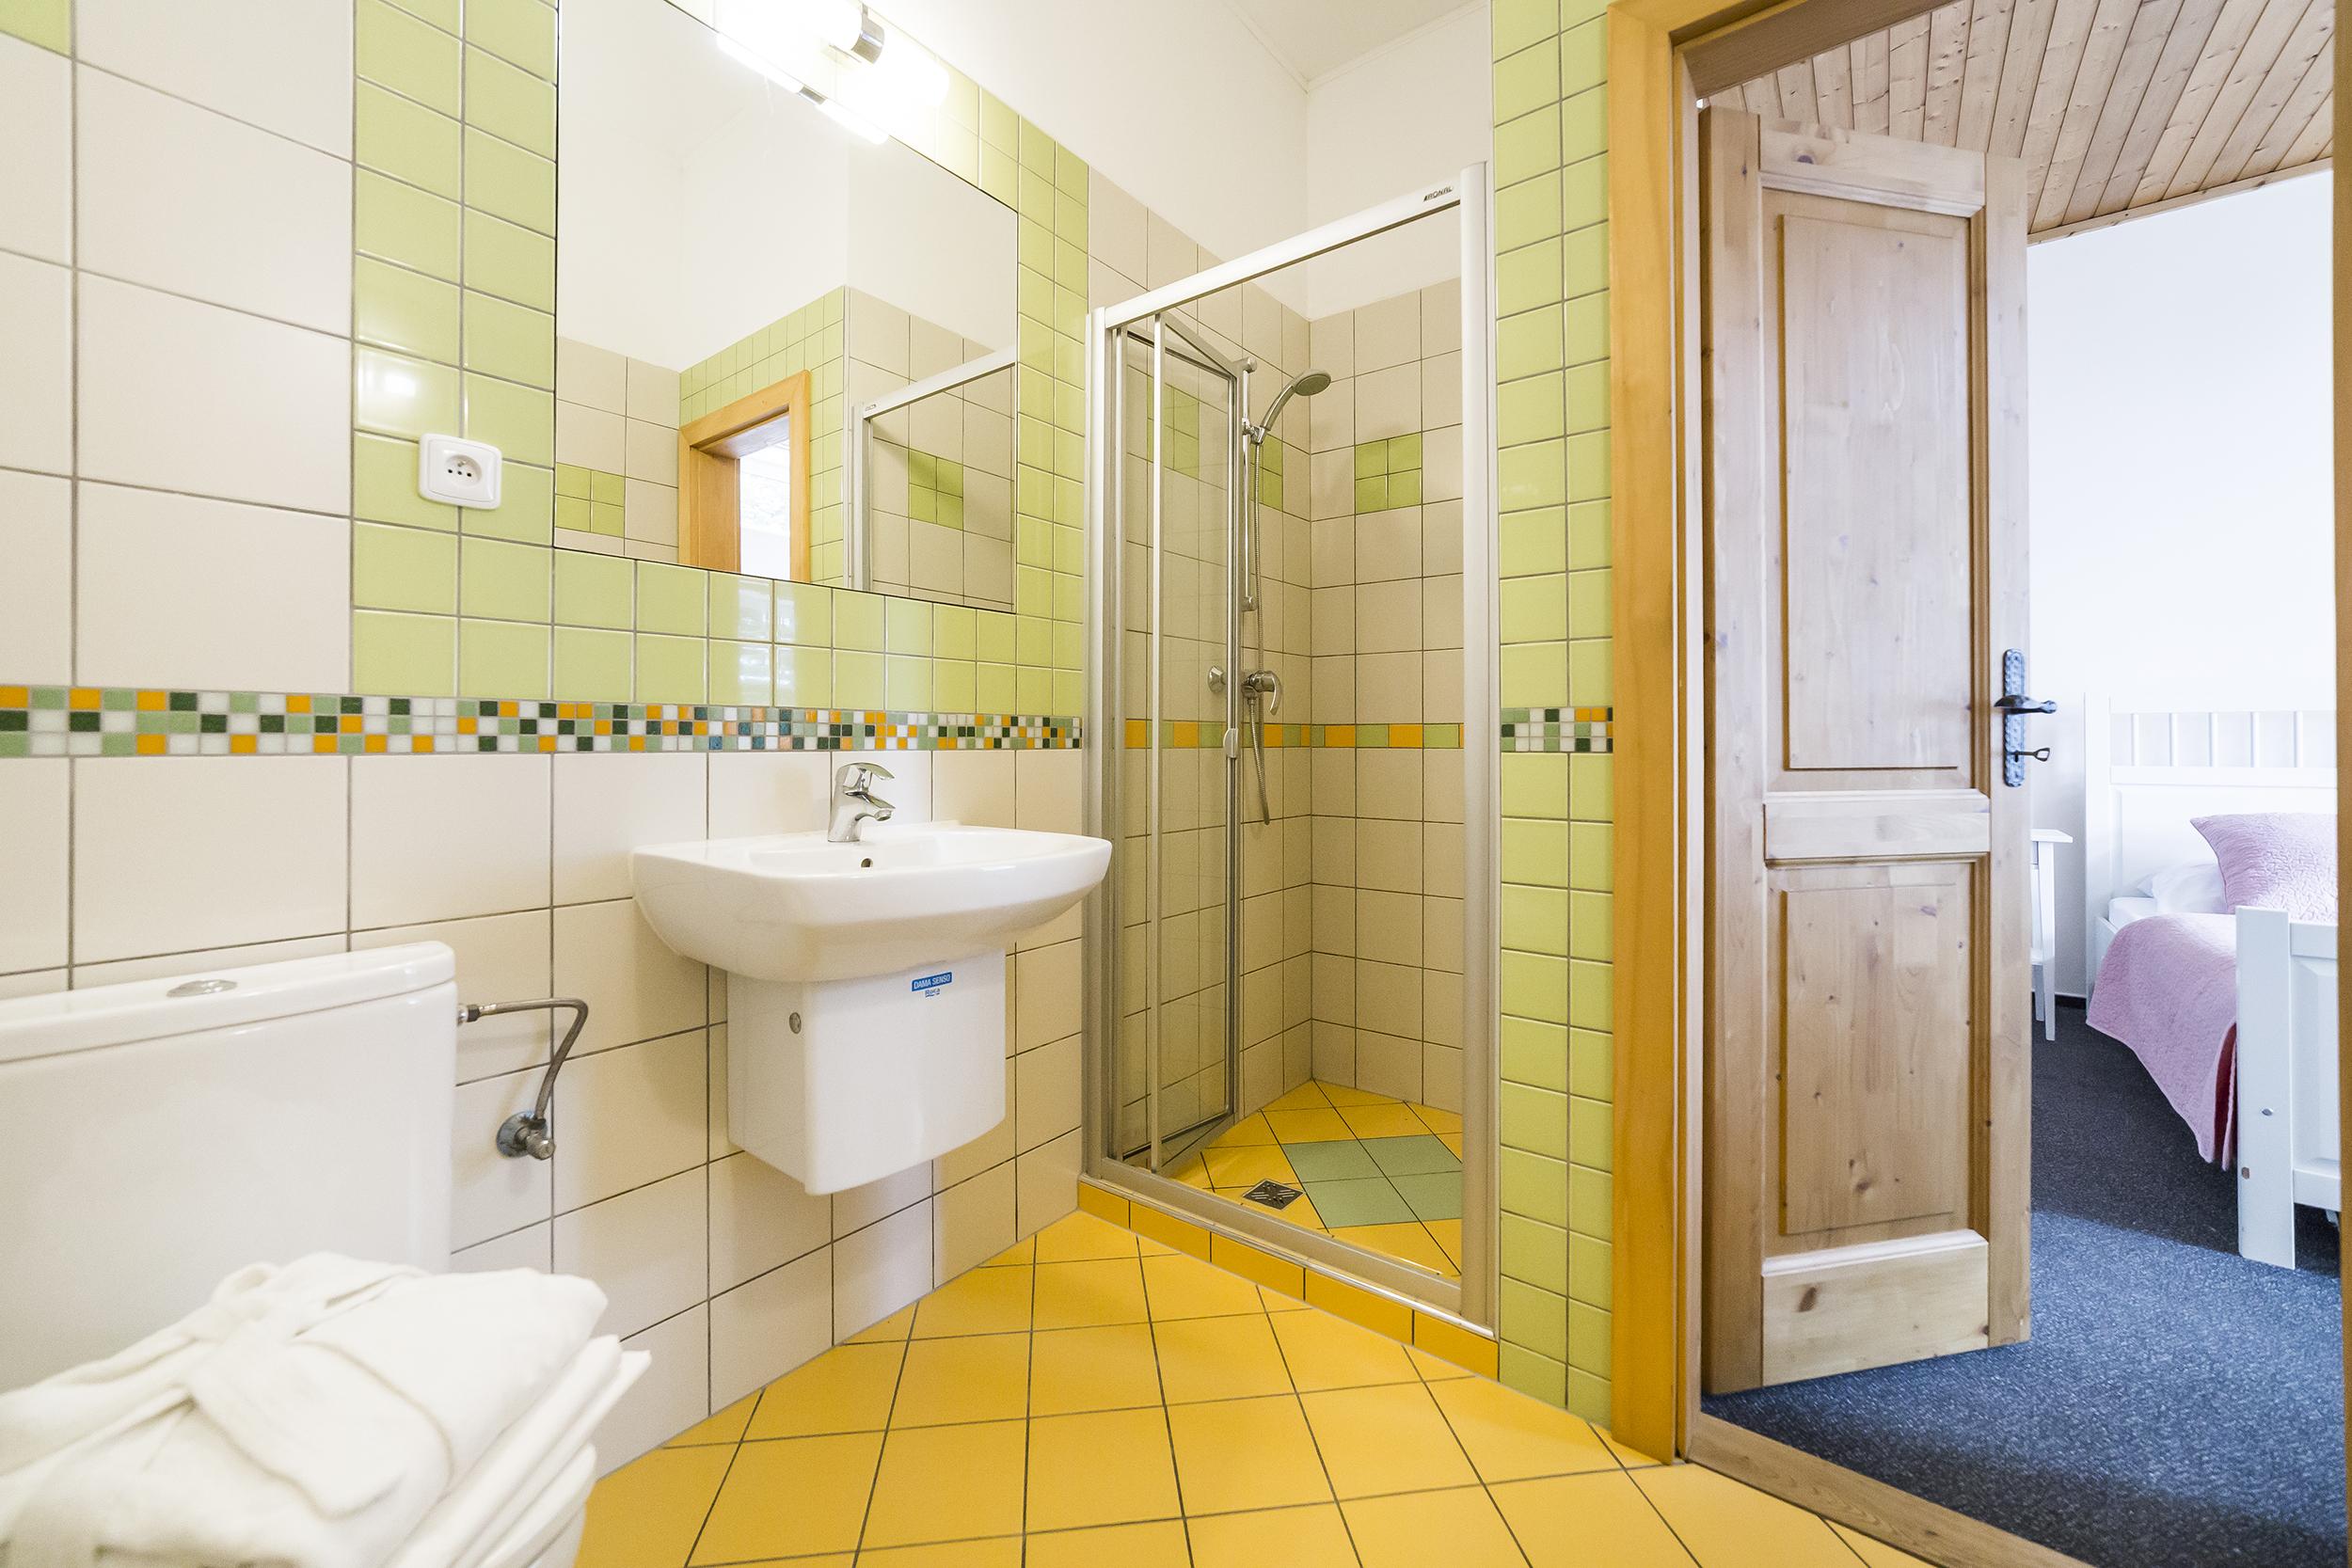 koupelna radunka apartman dvere sprcha umyvadlo zachod zrcadlo prodej domu radun linda bittova